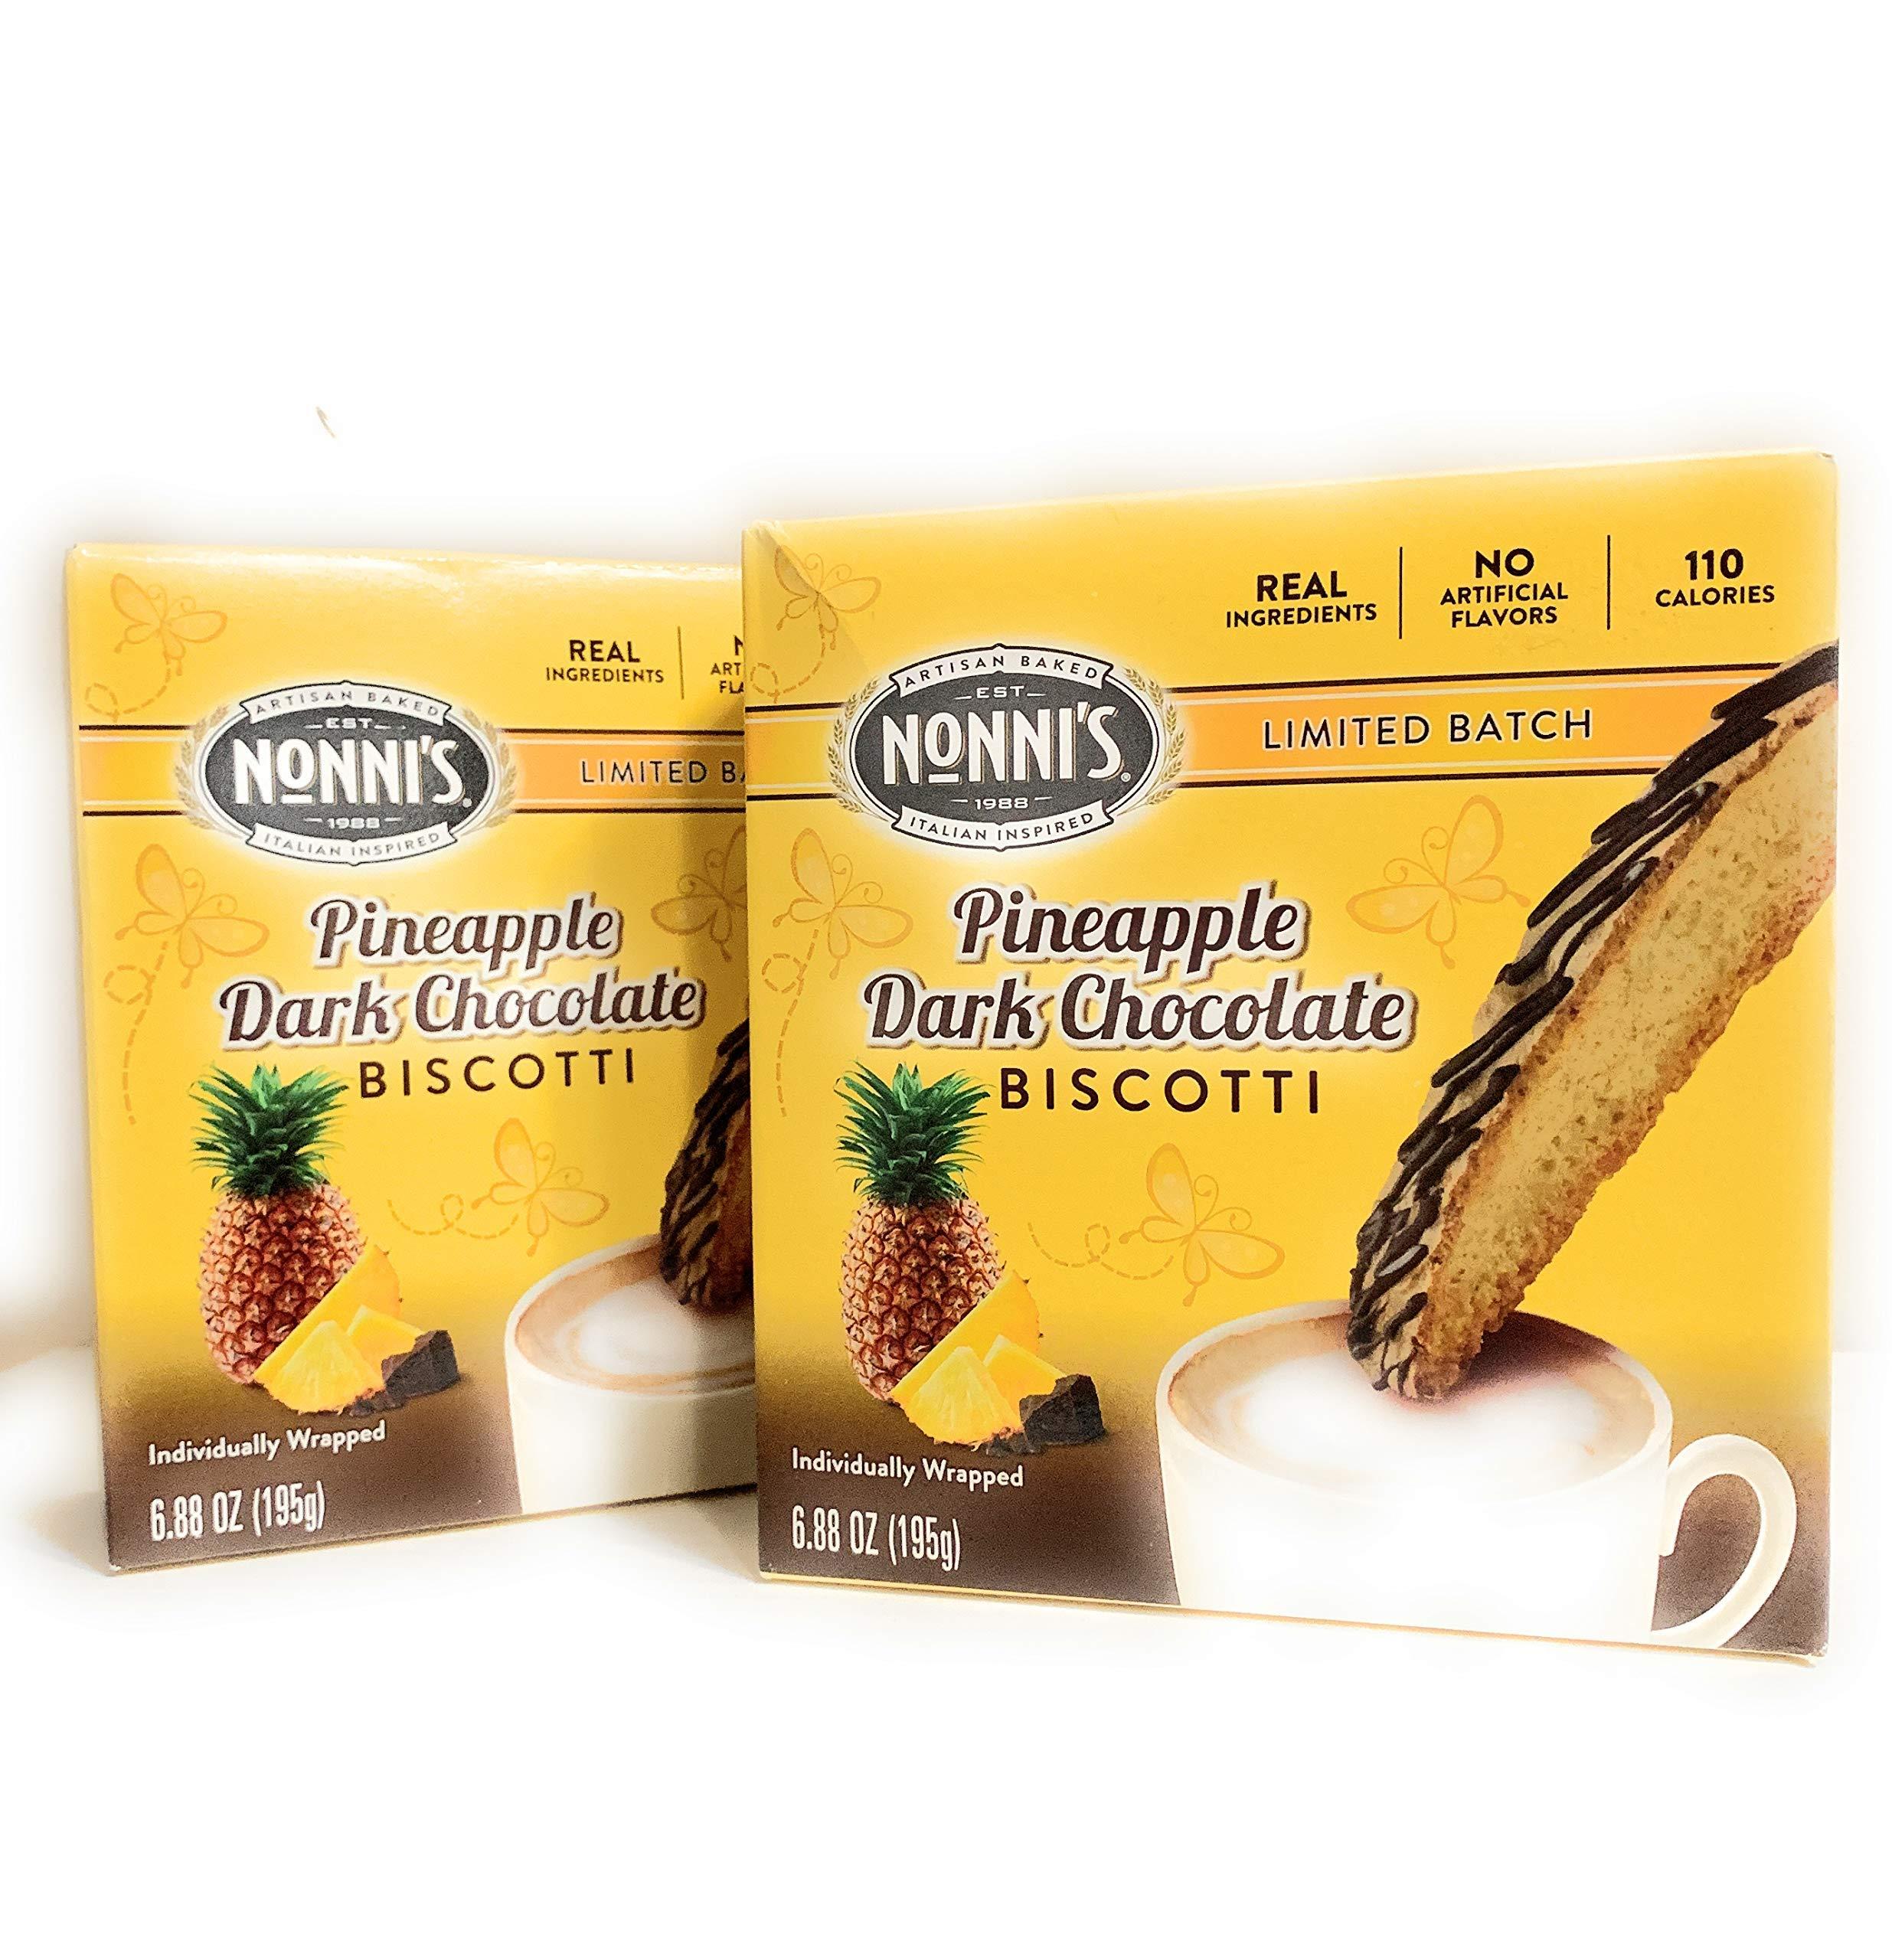 Limited Batch - Nonni's Pineapple Dark Chocolate Biscotti 2 pack 6.88 oz each box by Nonni's